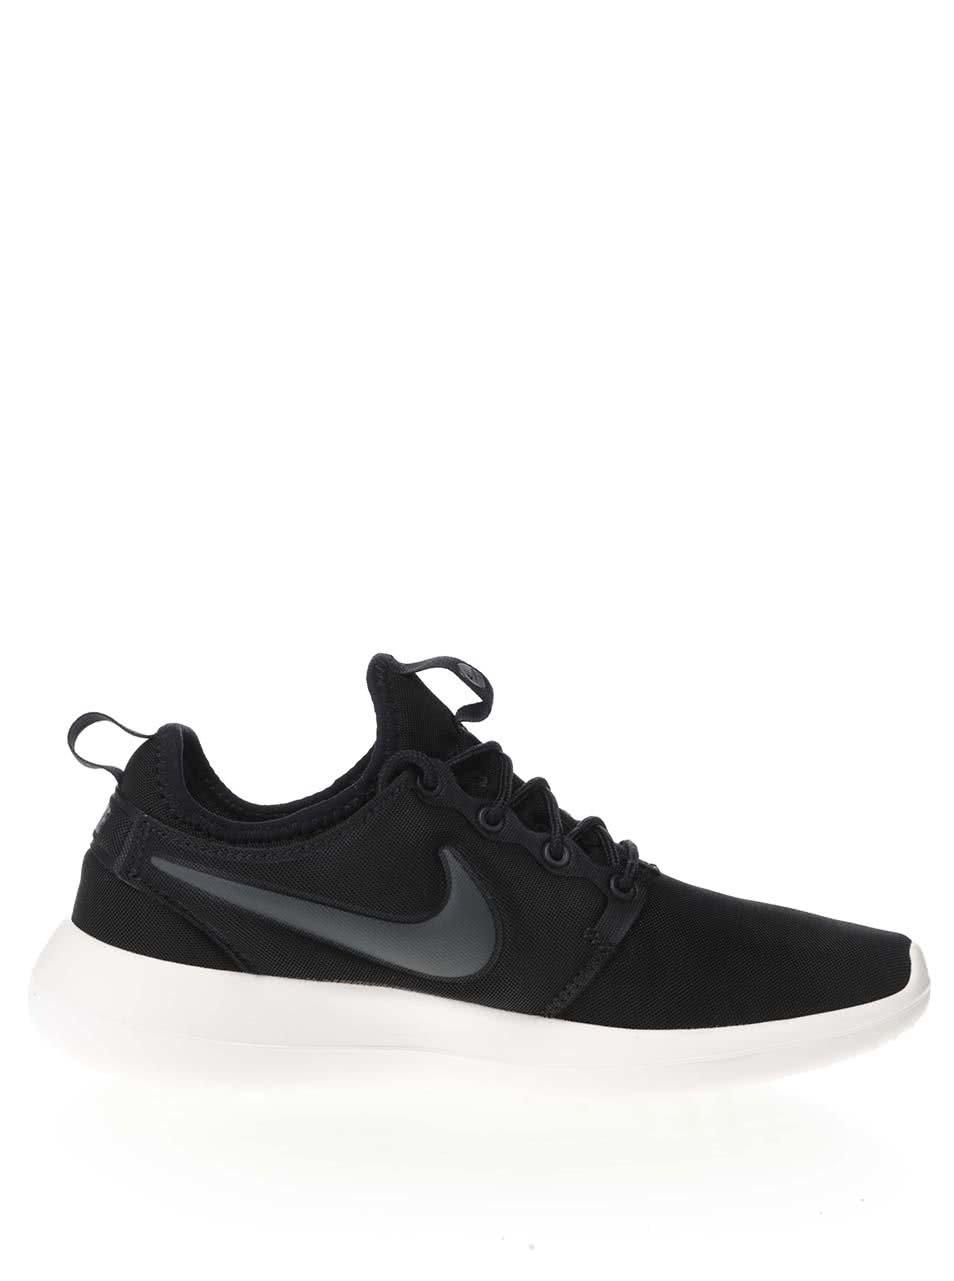 Čierne dámske tenisky Nike Roshe Two ... 075857342e7